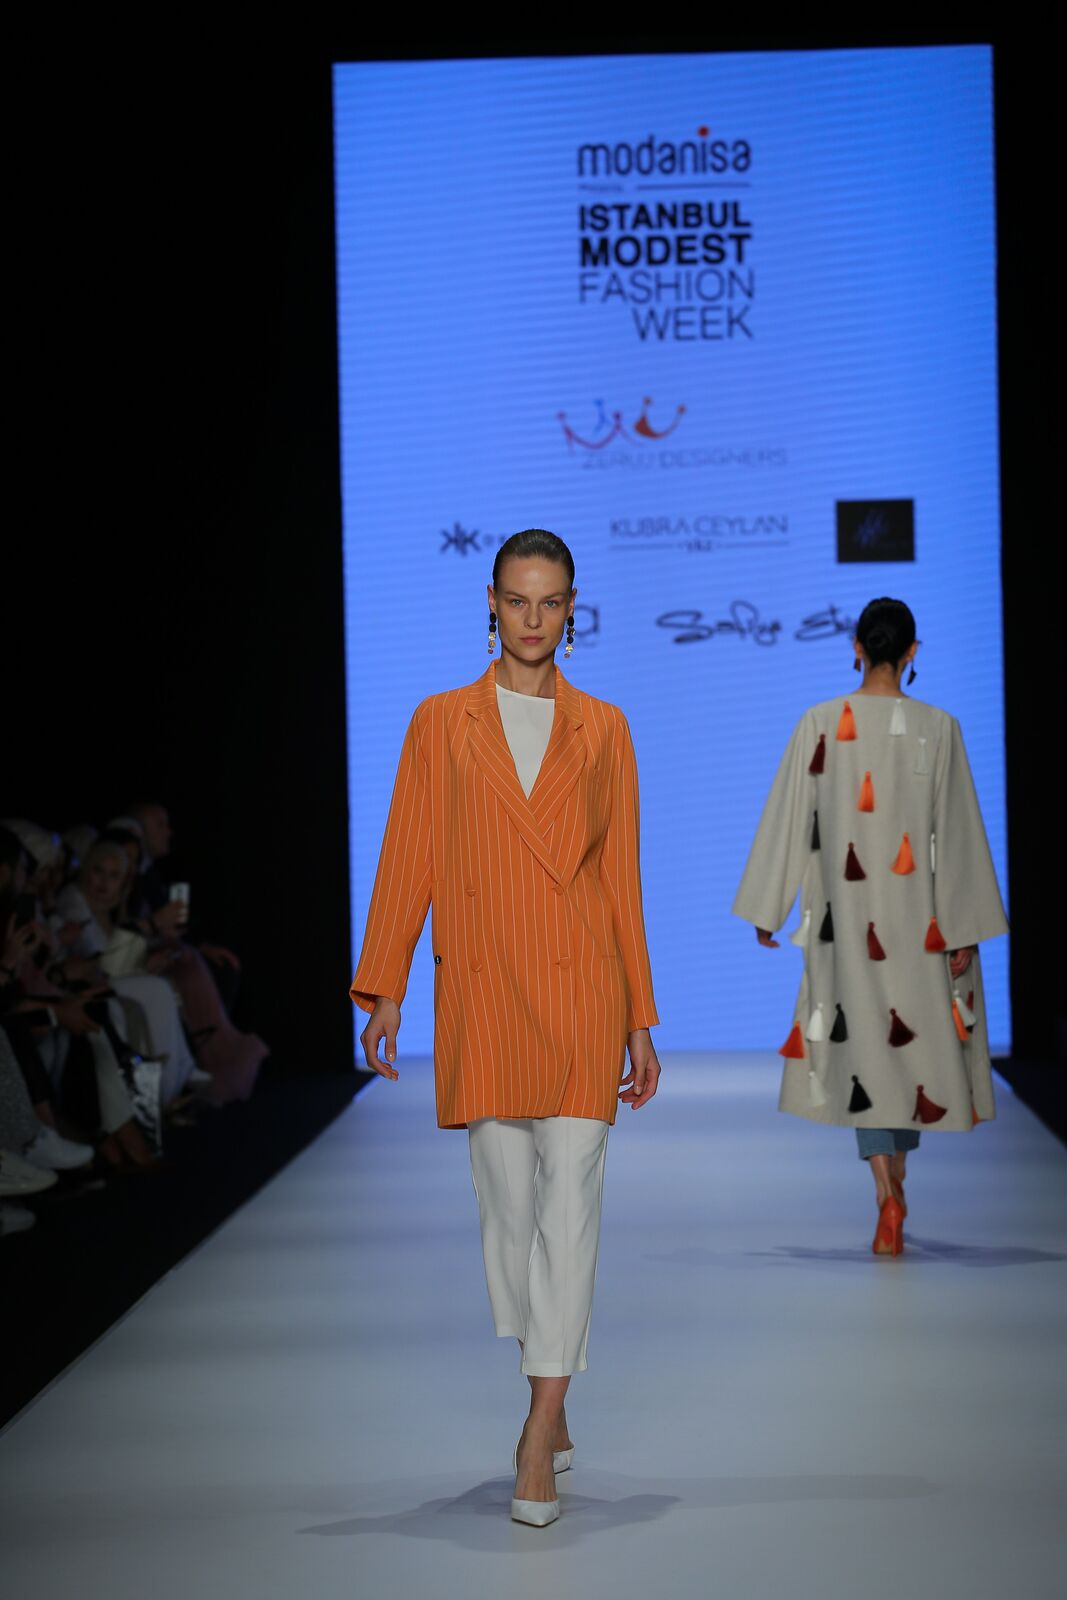 Zeruj at istanbul modest fashion week 2019 day 2